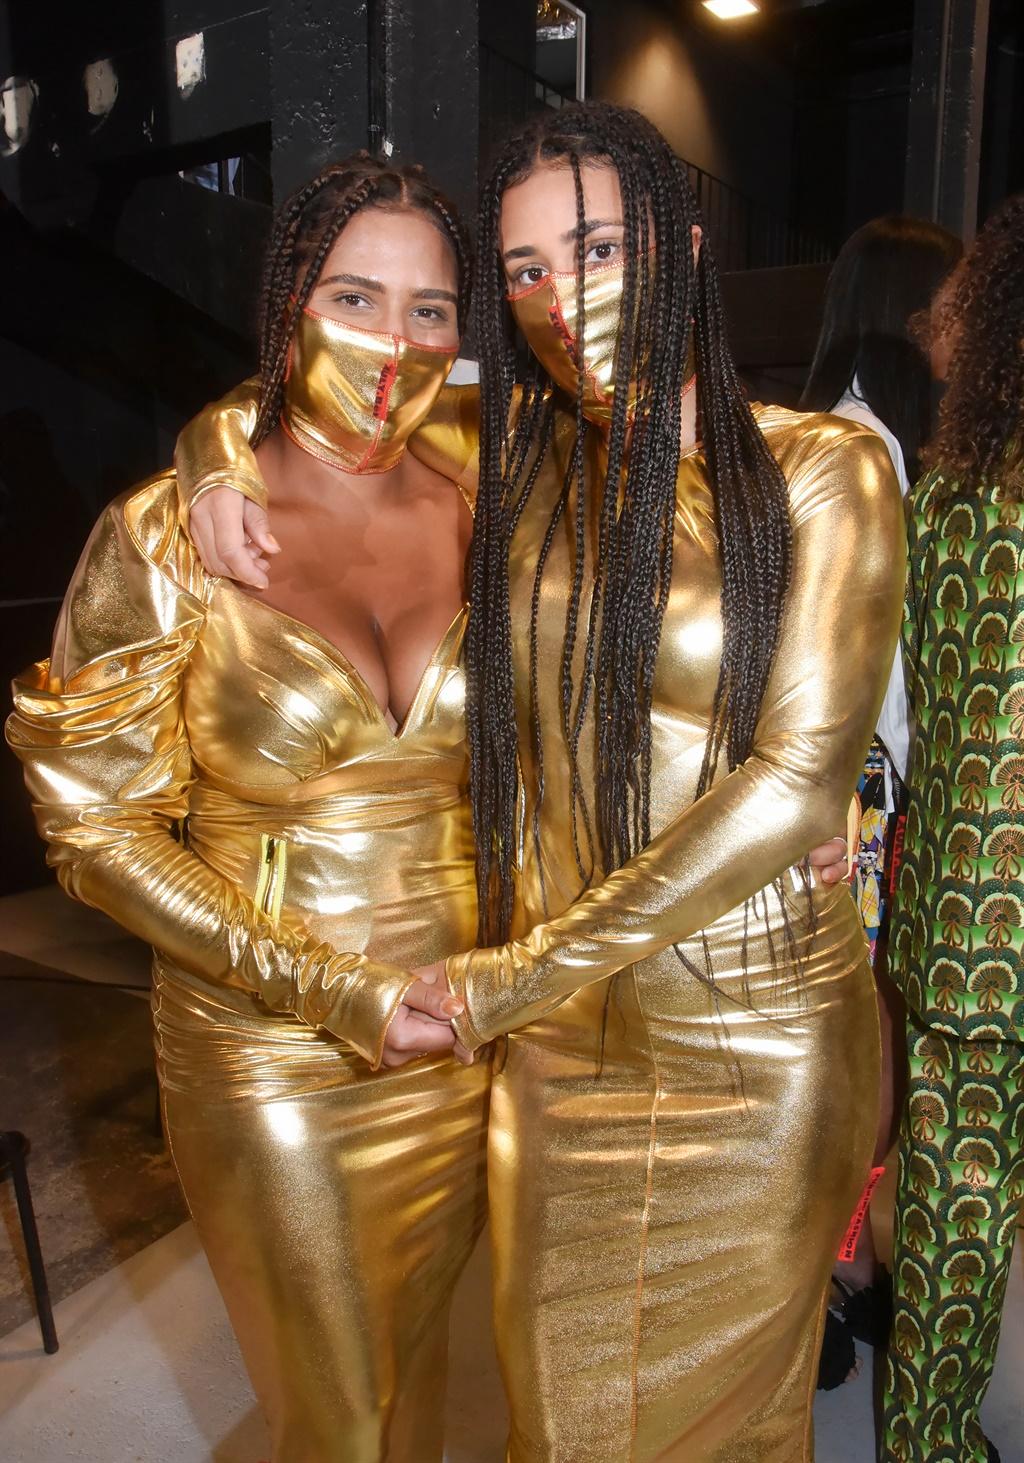 PARIS, FRANCE - OCTOBER 05: Models Naïma Dante an